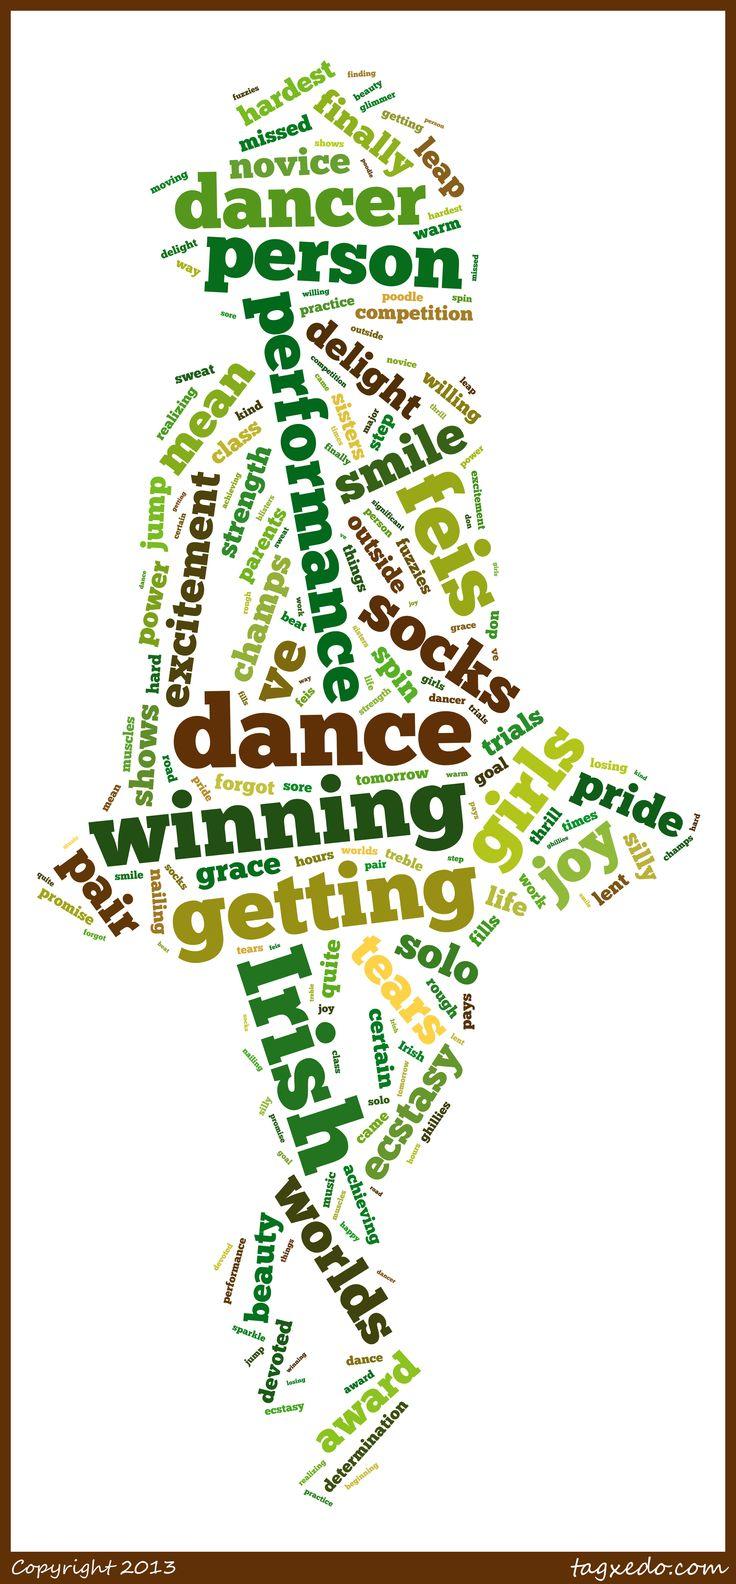 Irish dance from http://www.tagxedo.com/